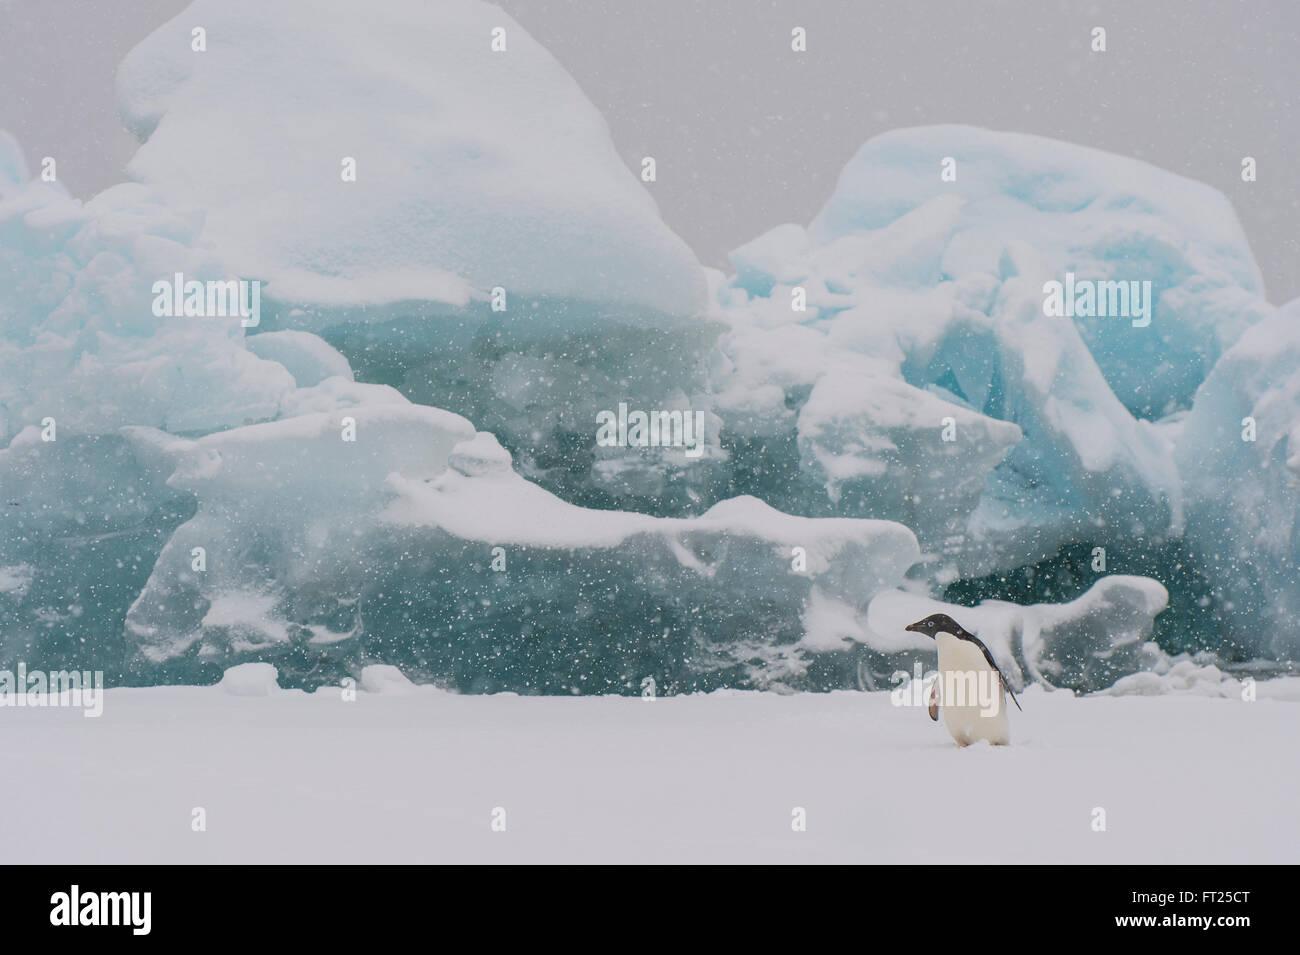 Adelie Penguin on an Iceberg Stock Photo: 100851768 - Alamy